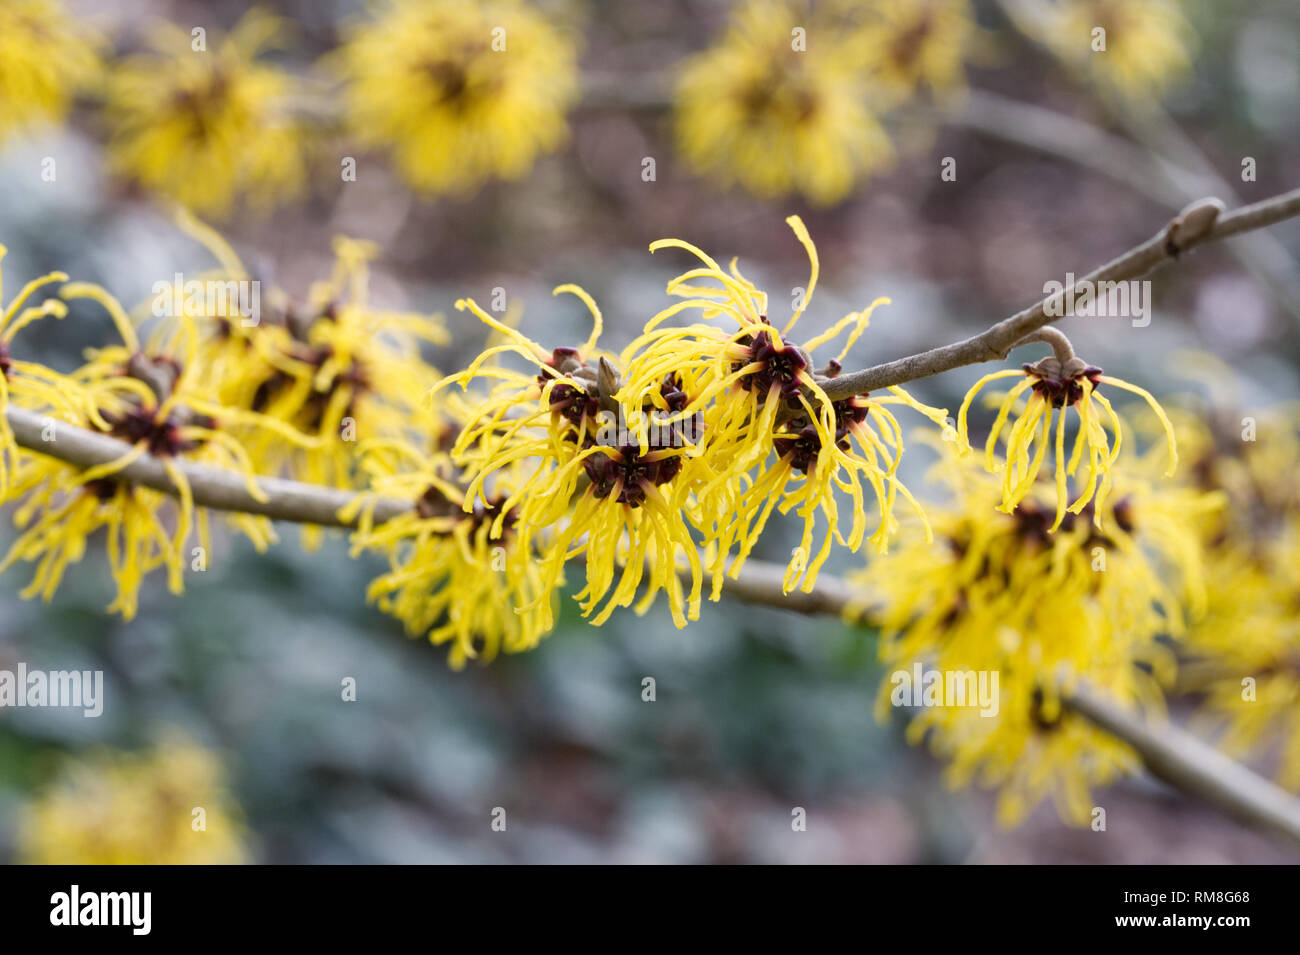 Hamamelis x intermedia 'Barmstedt Gold'. Witch hazel flowers. - Stock Image